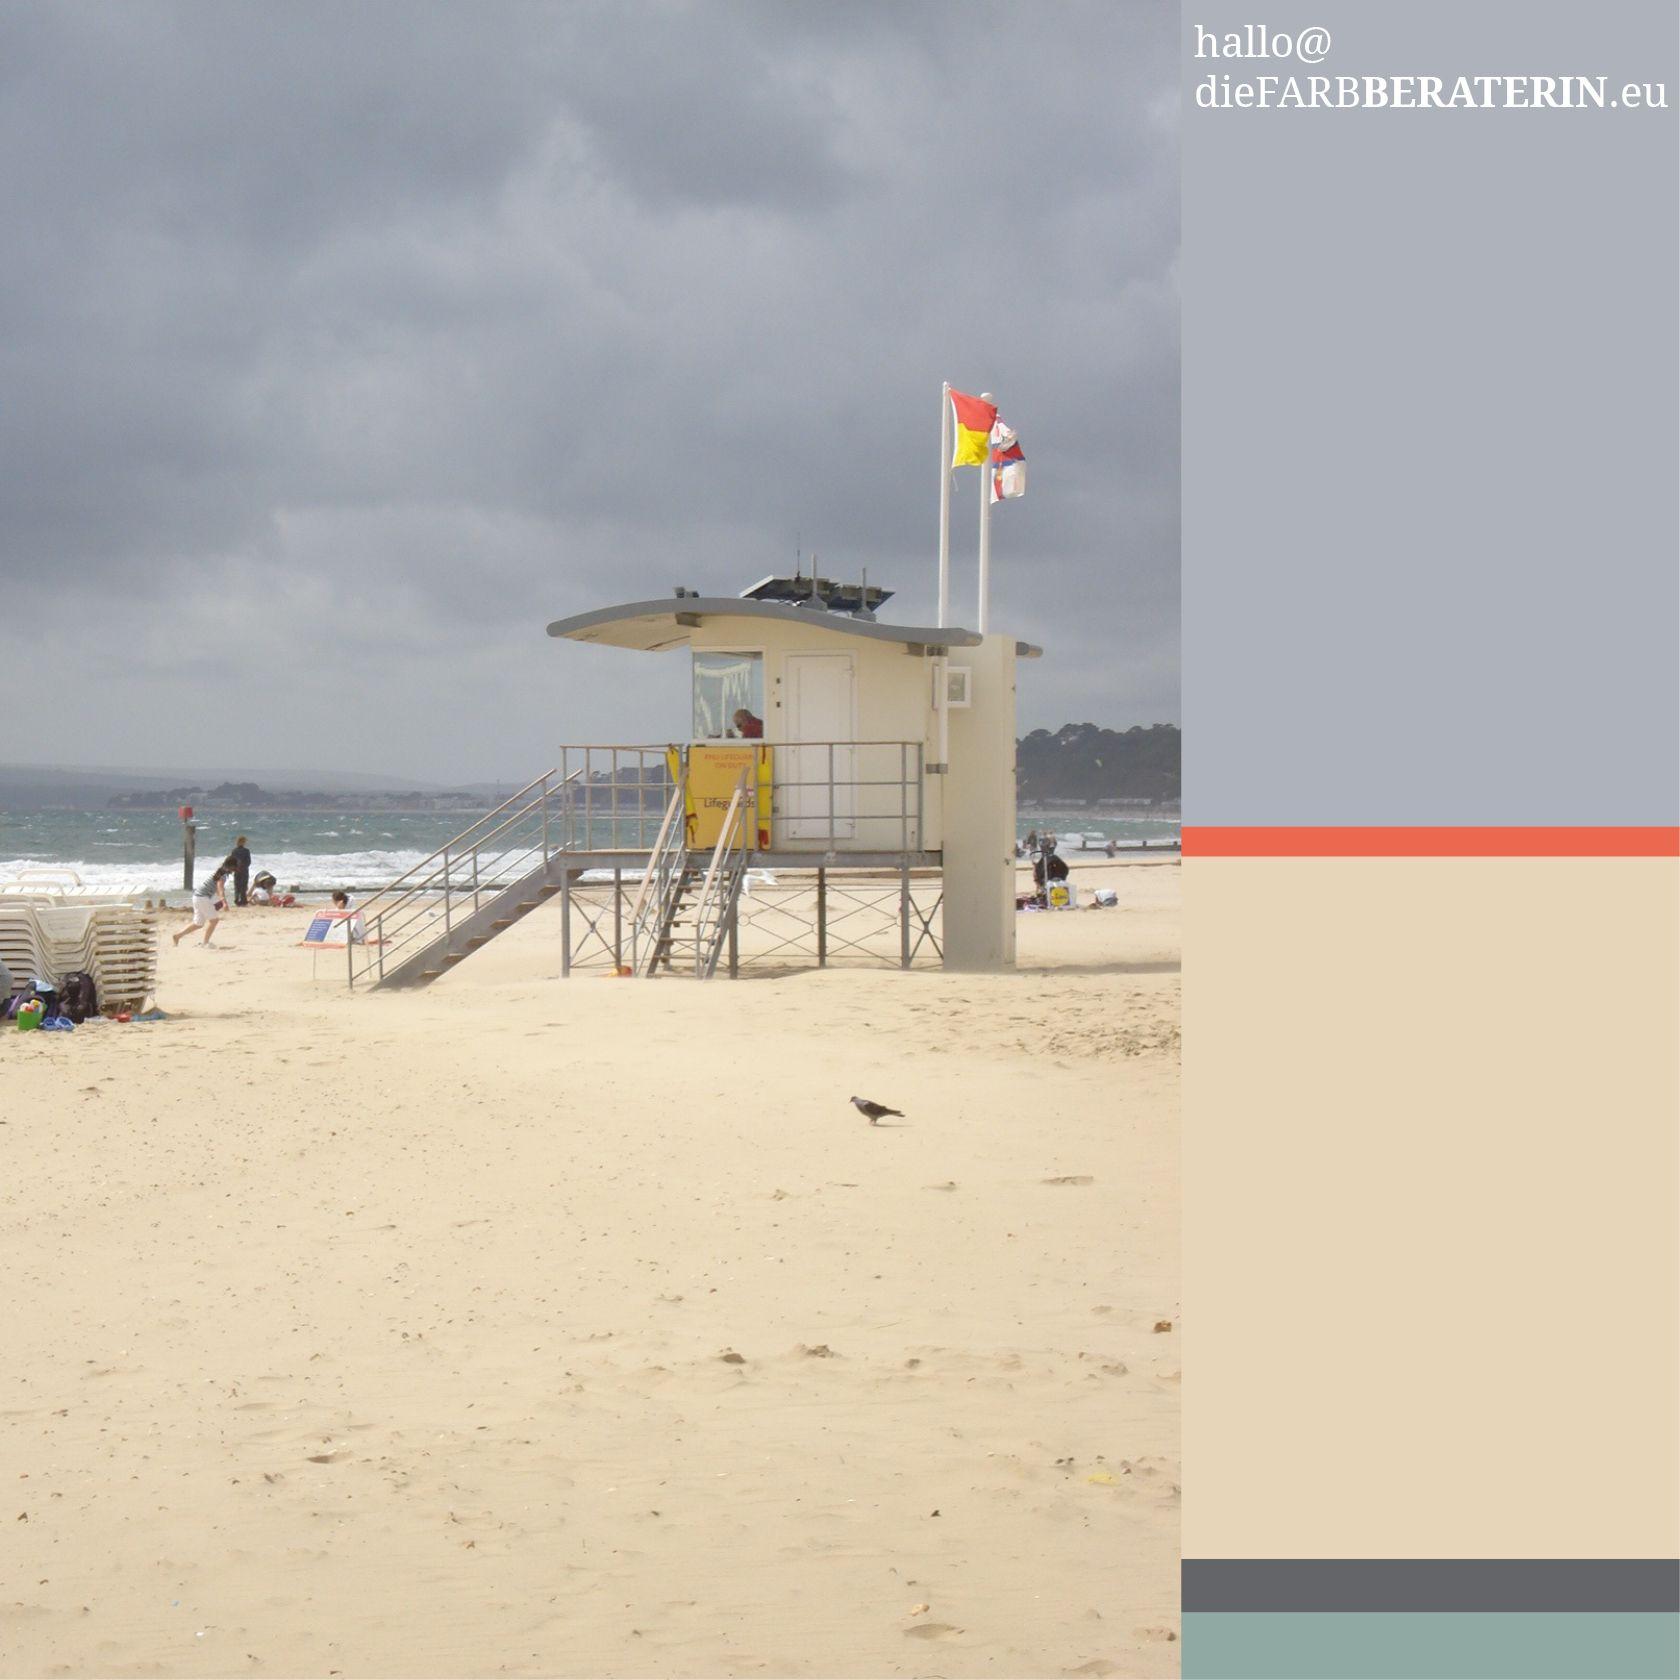 Farbkombinationen Blau Grau: #farbinspiration #bounemouth #beach #dorset #england #2008